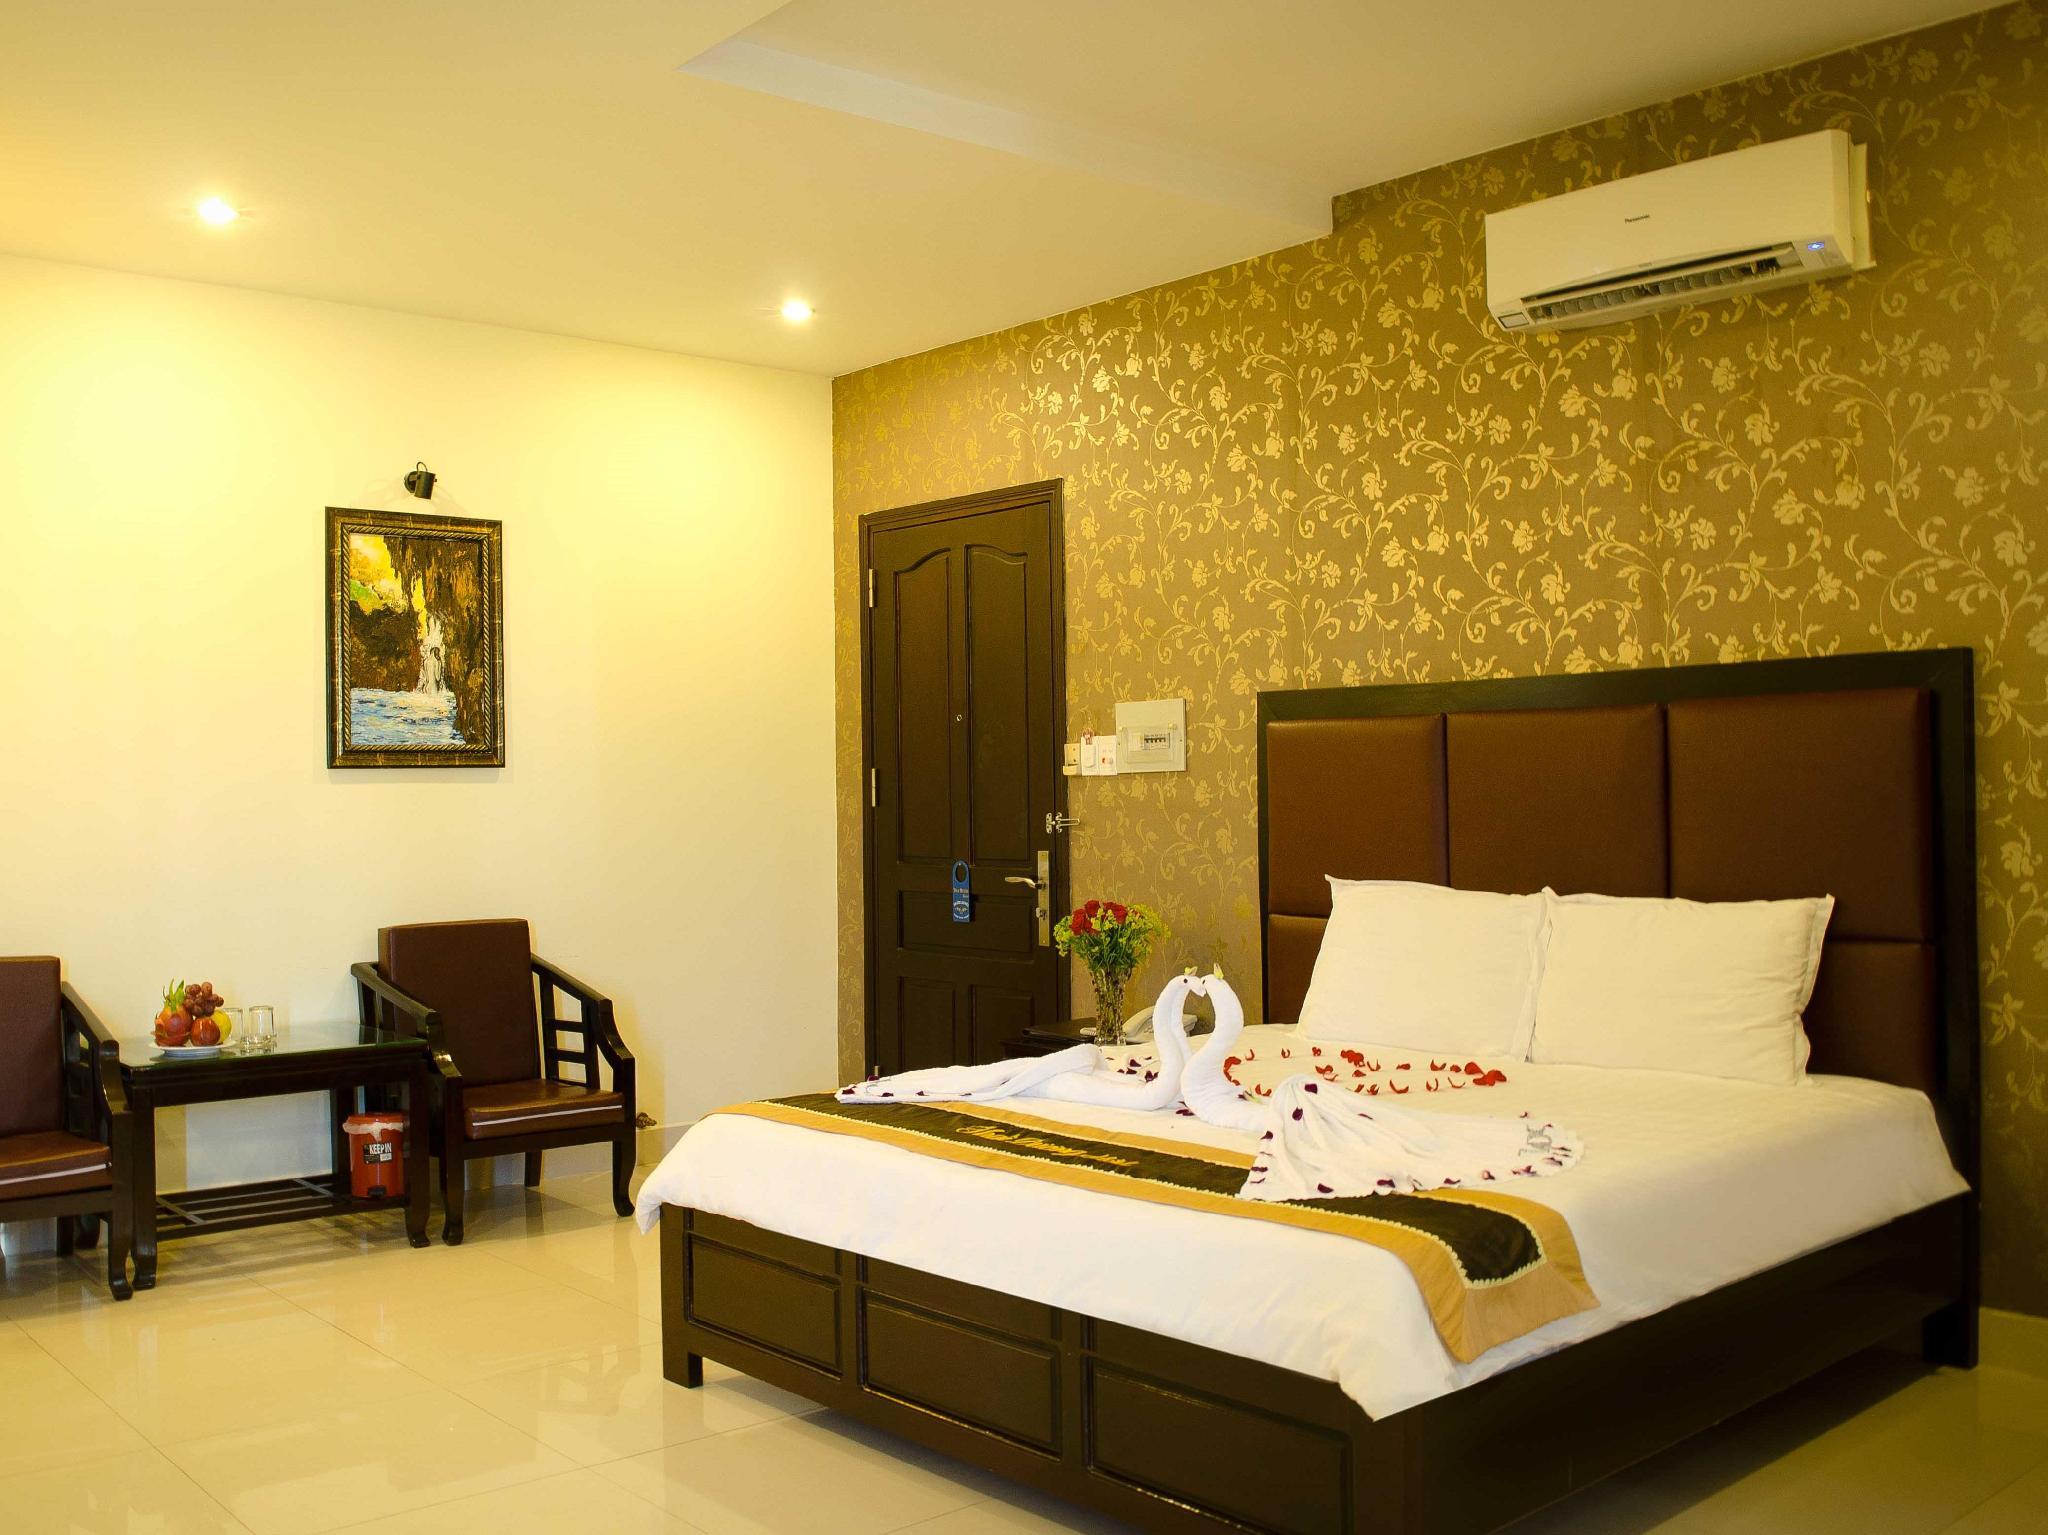 Thai Duong Hotel - Truong Sa Street - Hotell och Boende i Vietnam , Da Nang